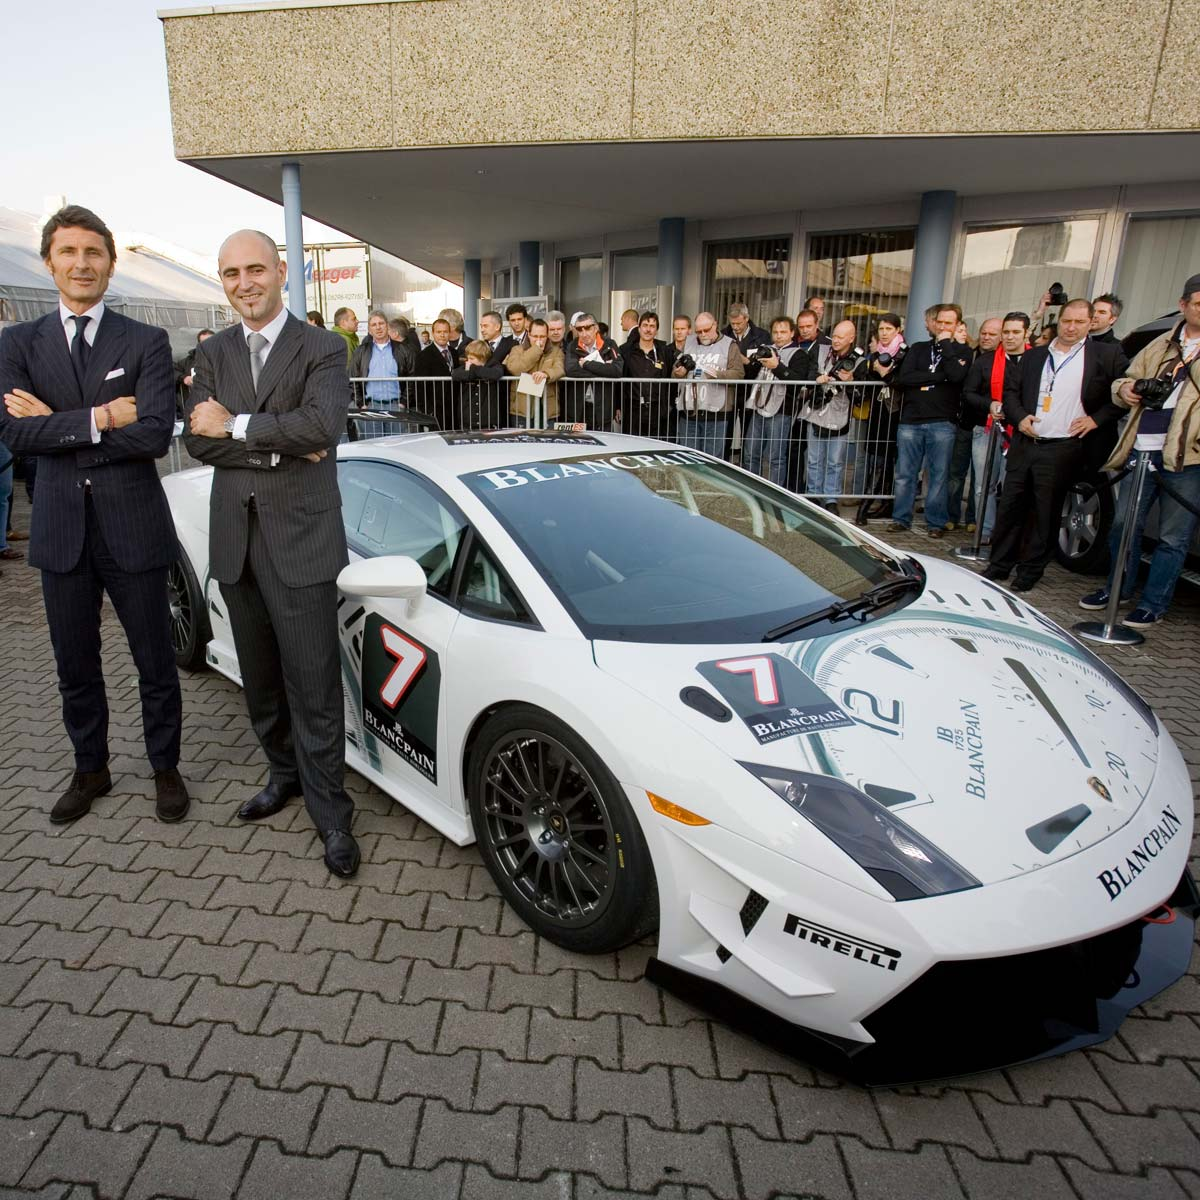 La Cote des Montres : Photo - Lamborghini Blancpain Super Trofeo